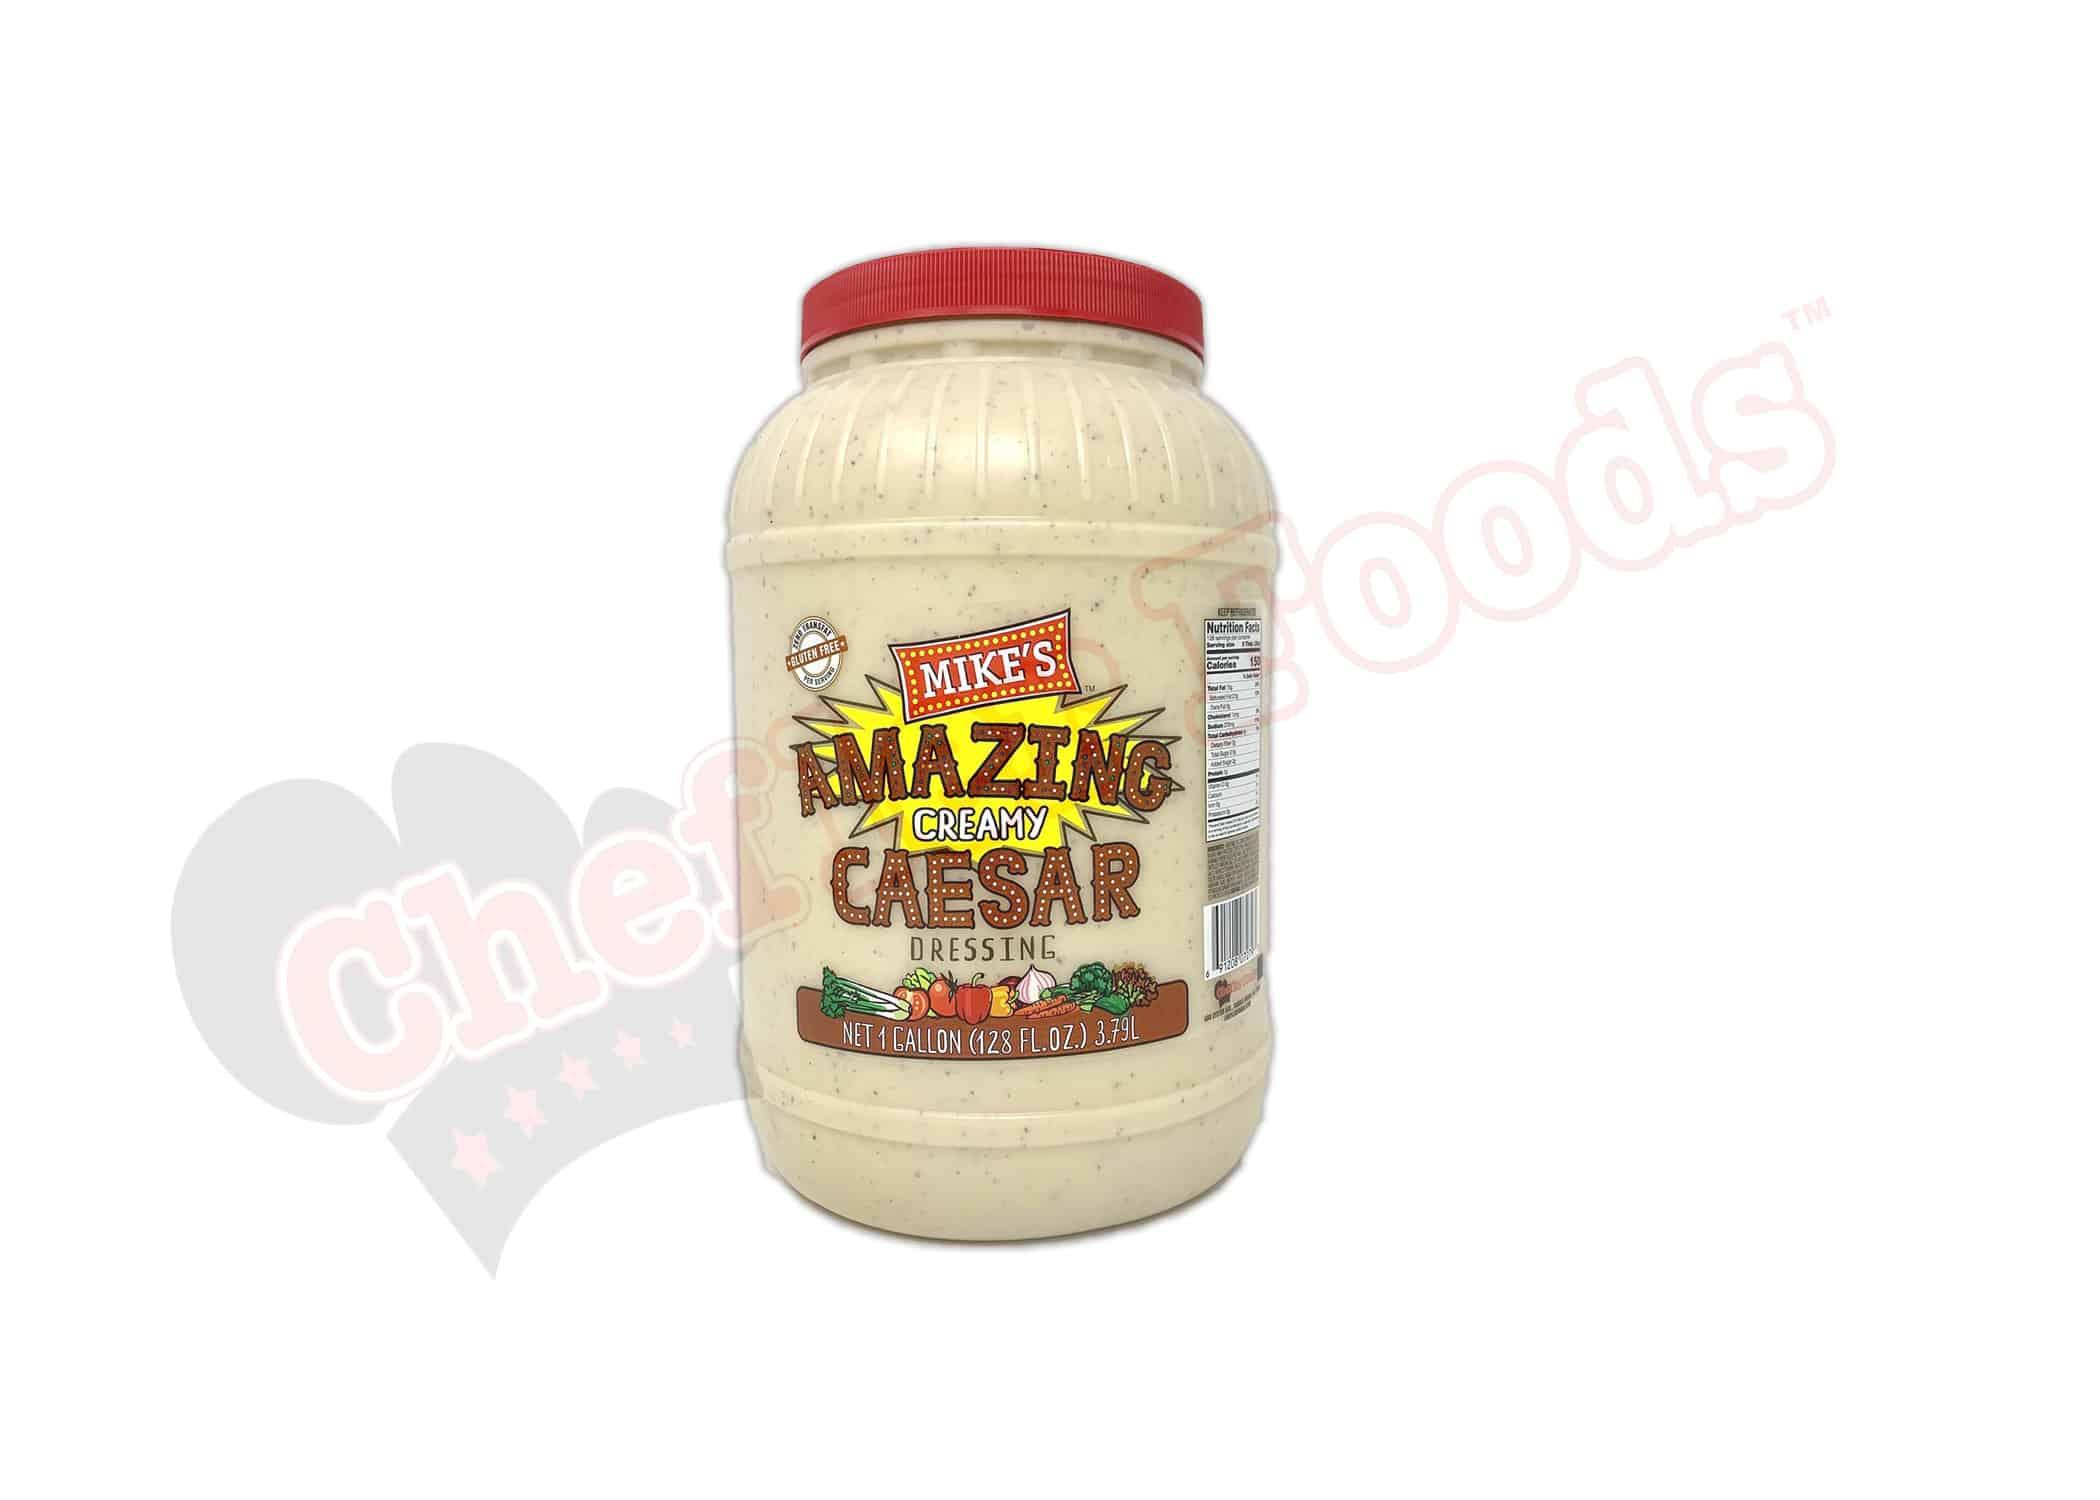 creamy caesar chefler